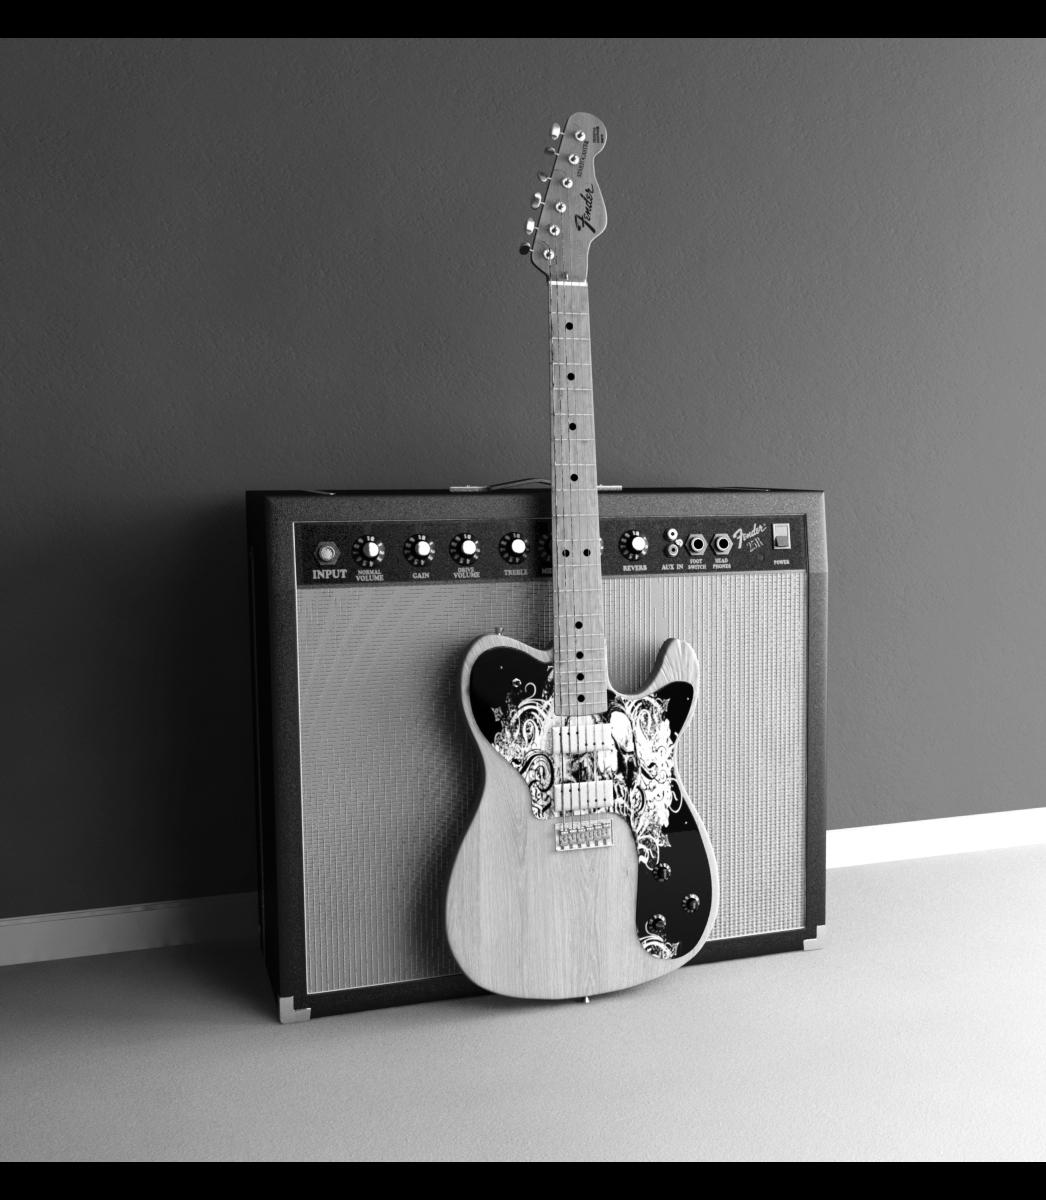 ... dimensional art objects music related 2009 2015 djreko black and white: djreko.deviantart.com/art/Fender-Guitar-AMP-BandW-113548248